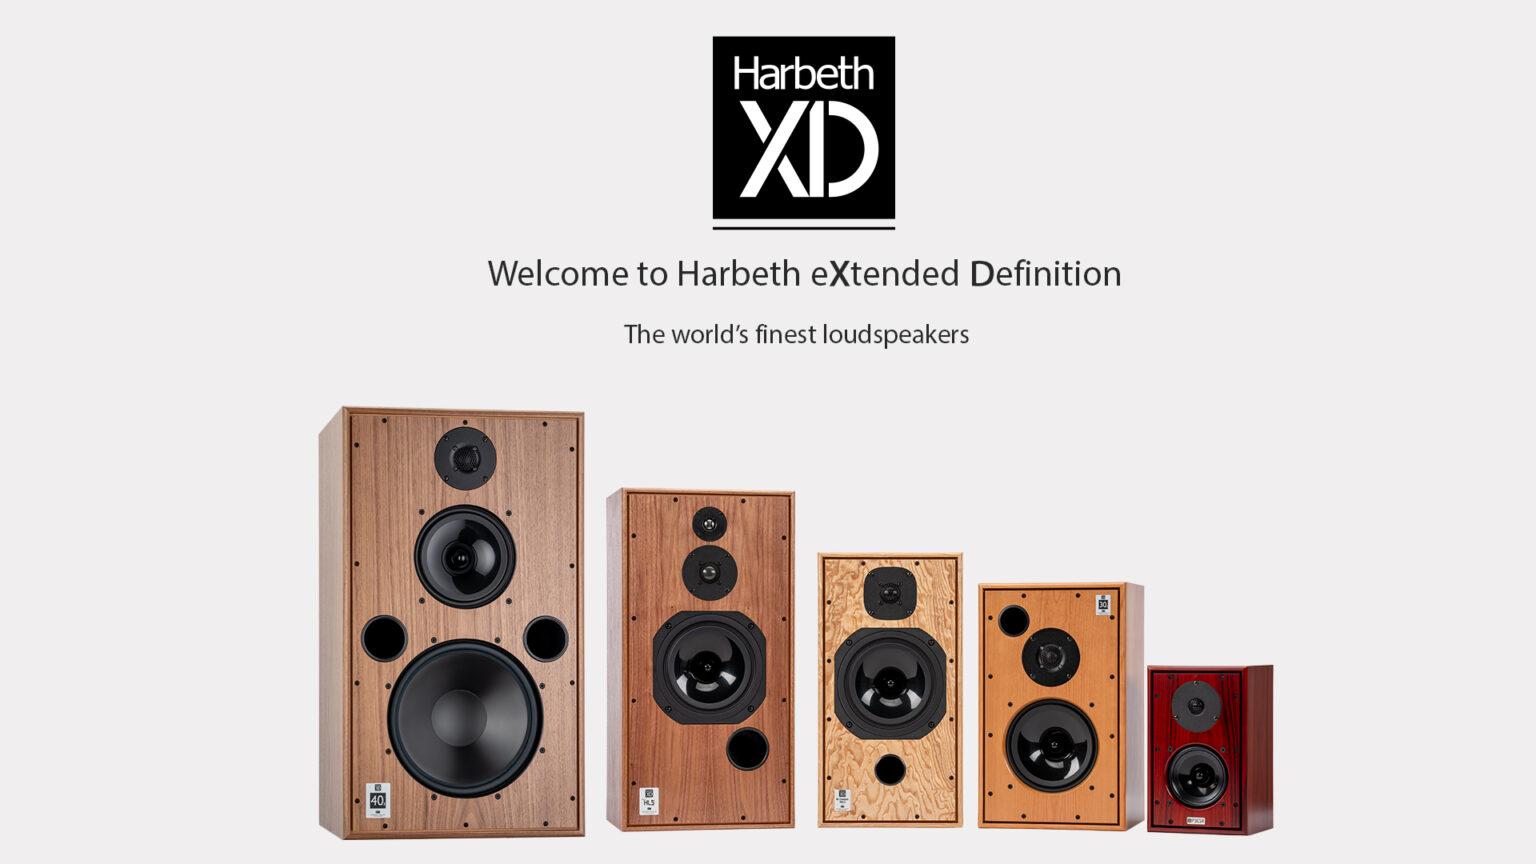 Harbeth-XD-Series-Banner-1-1536x864.jpg